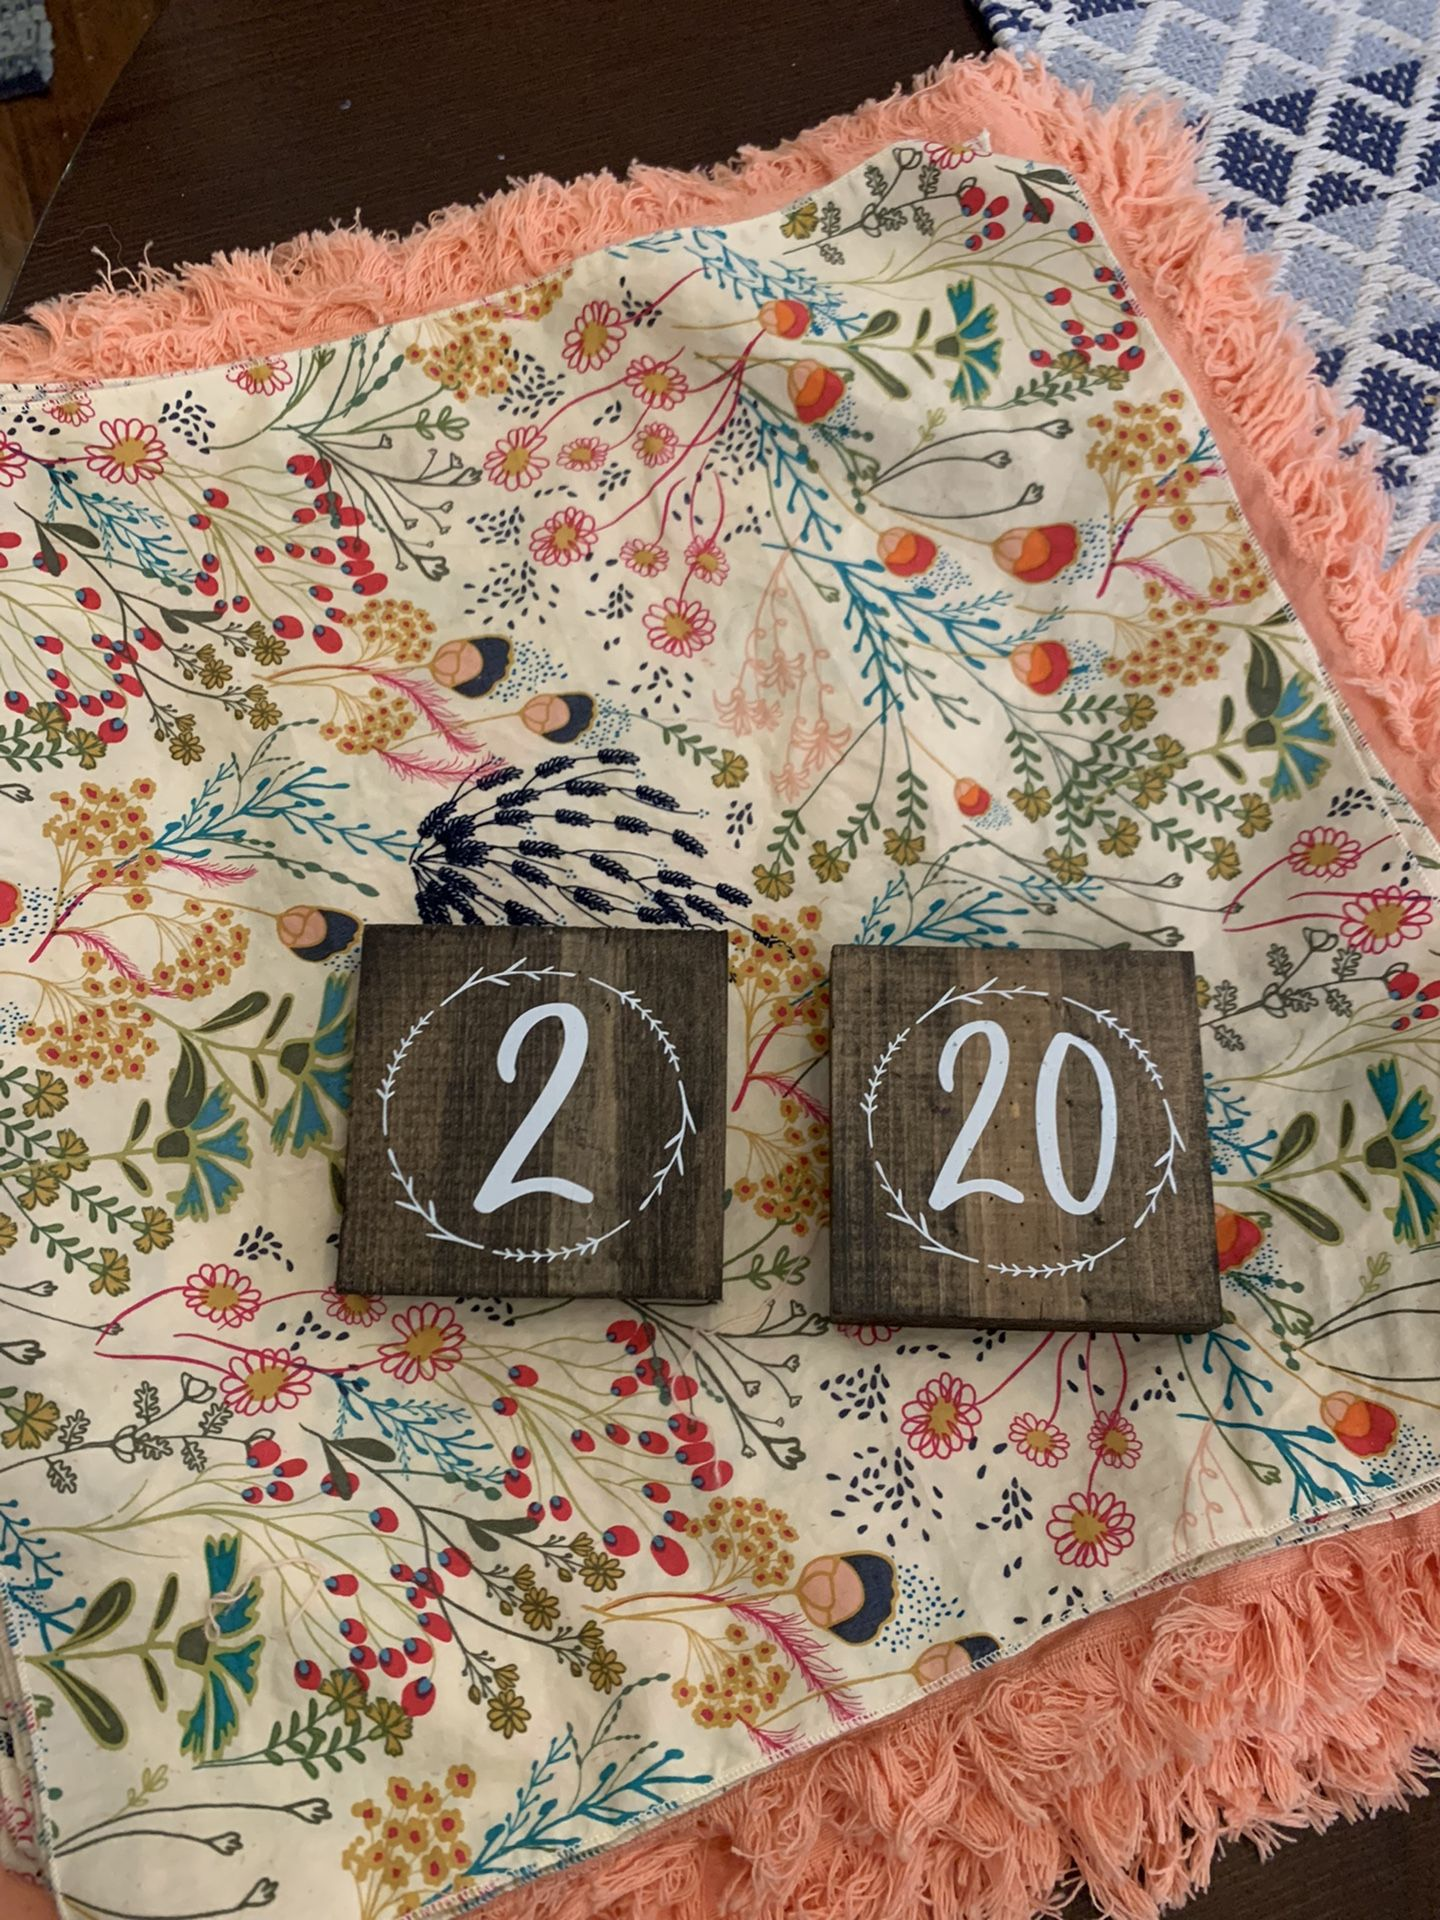 Wedding Table Numbers 1-20